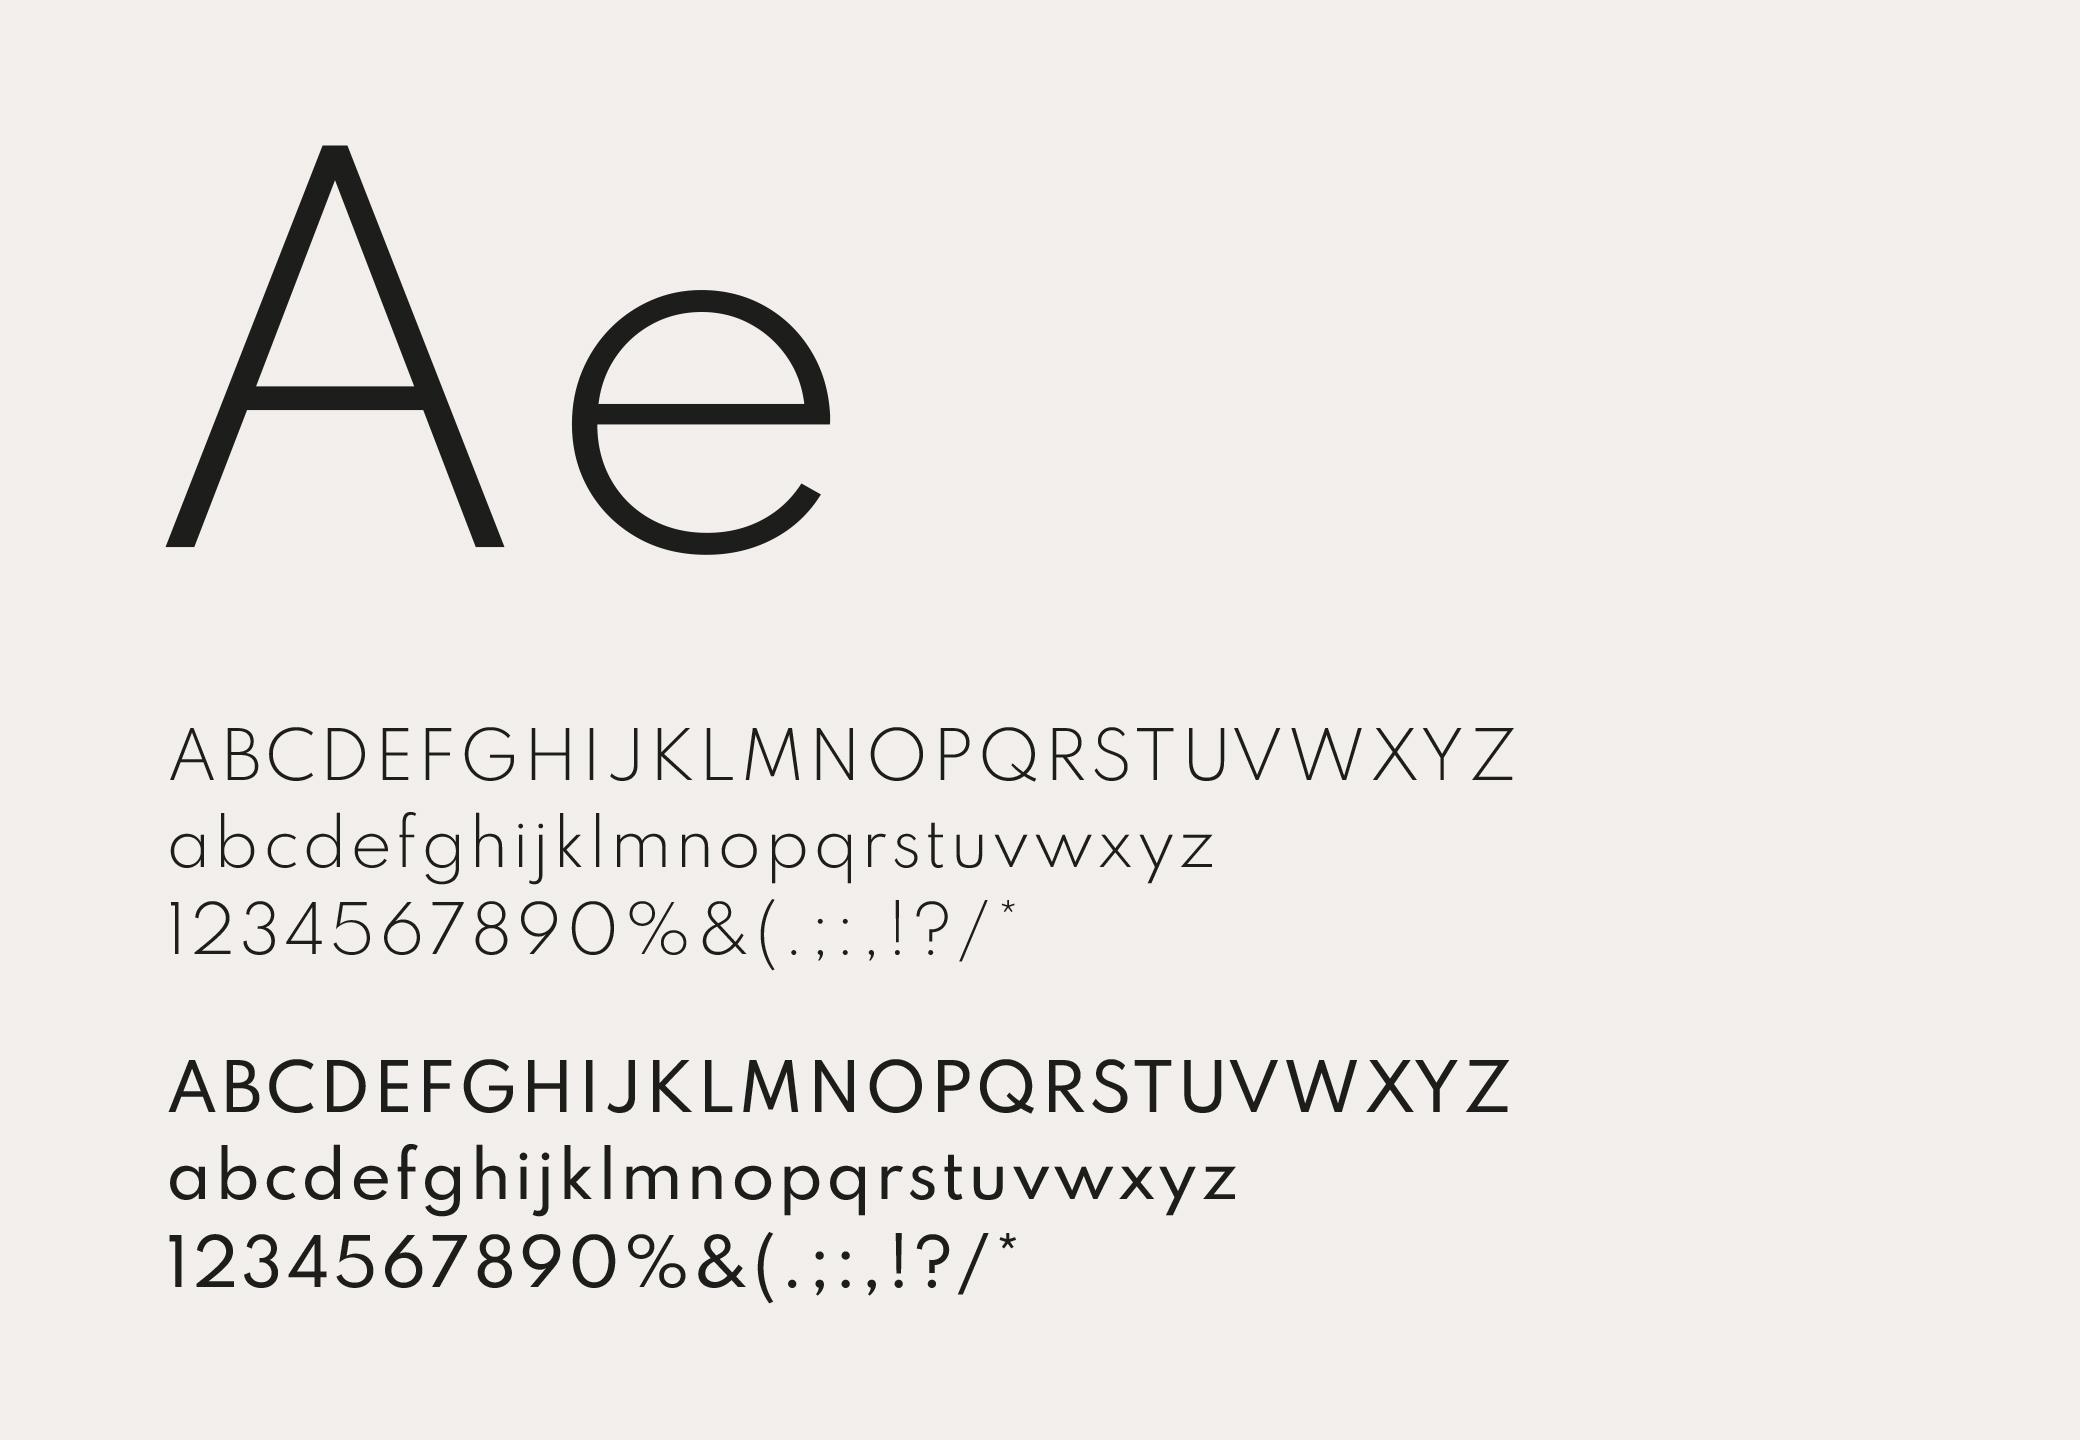 case_fuerdisdihei_typografie